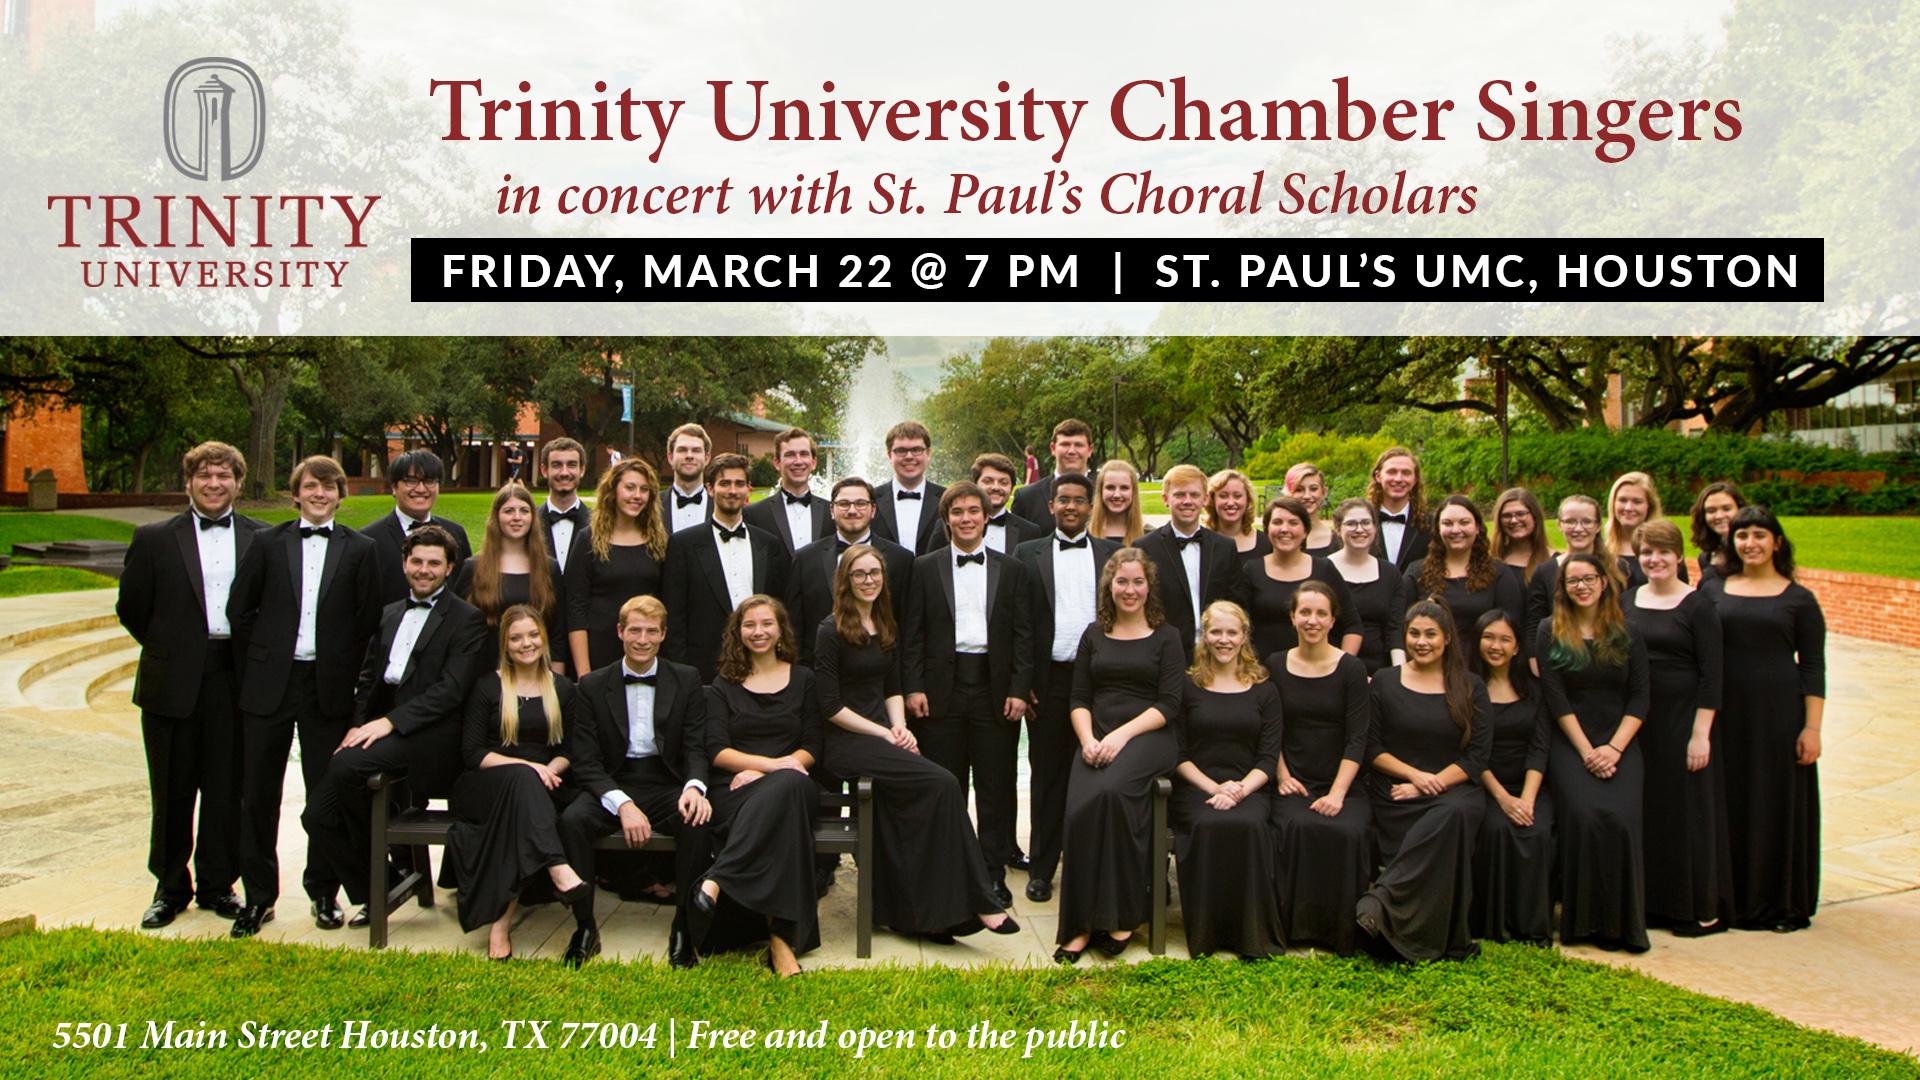 16x9-Trinity-University-singers.jpg